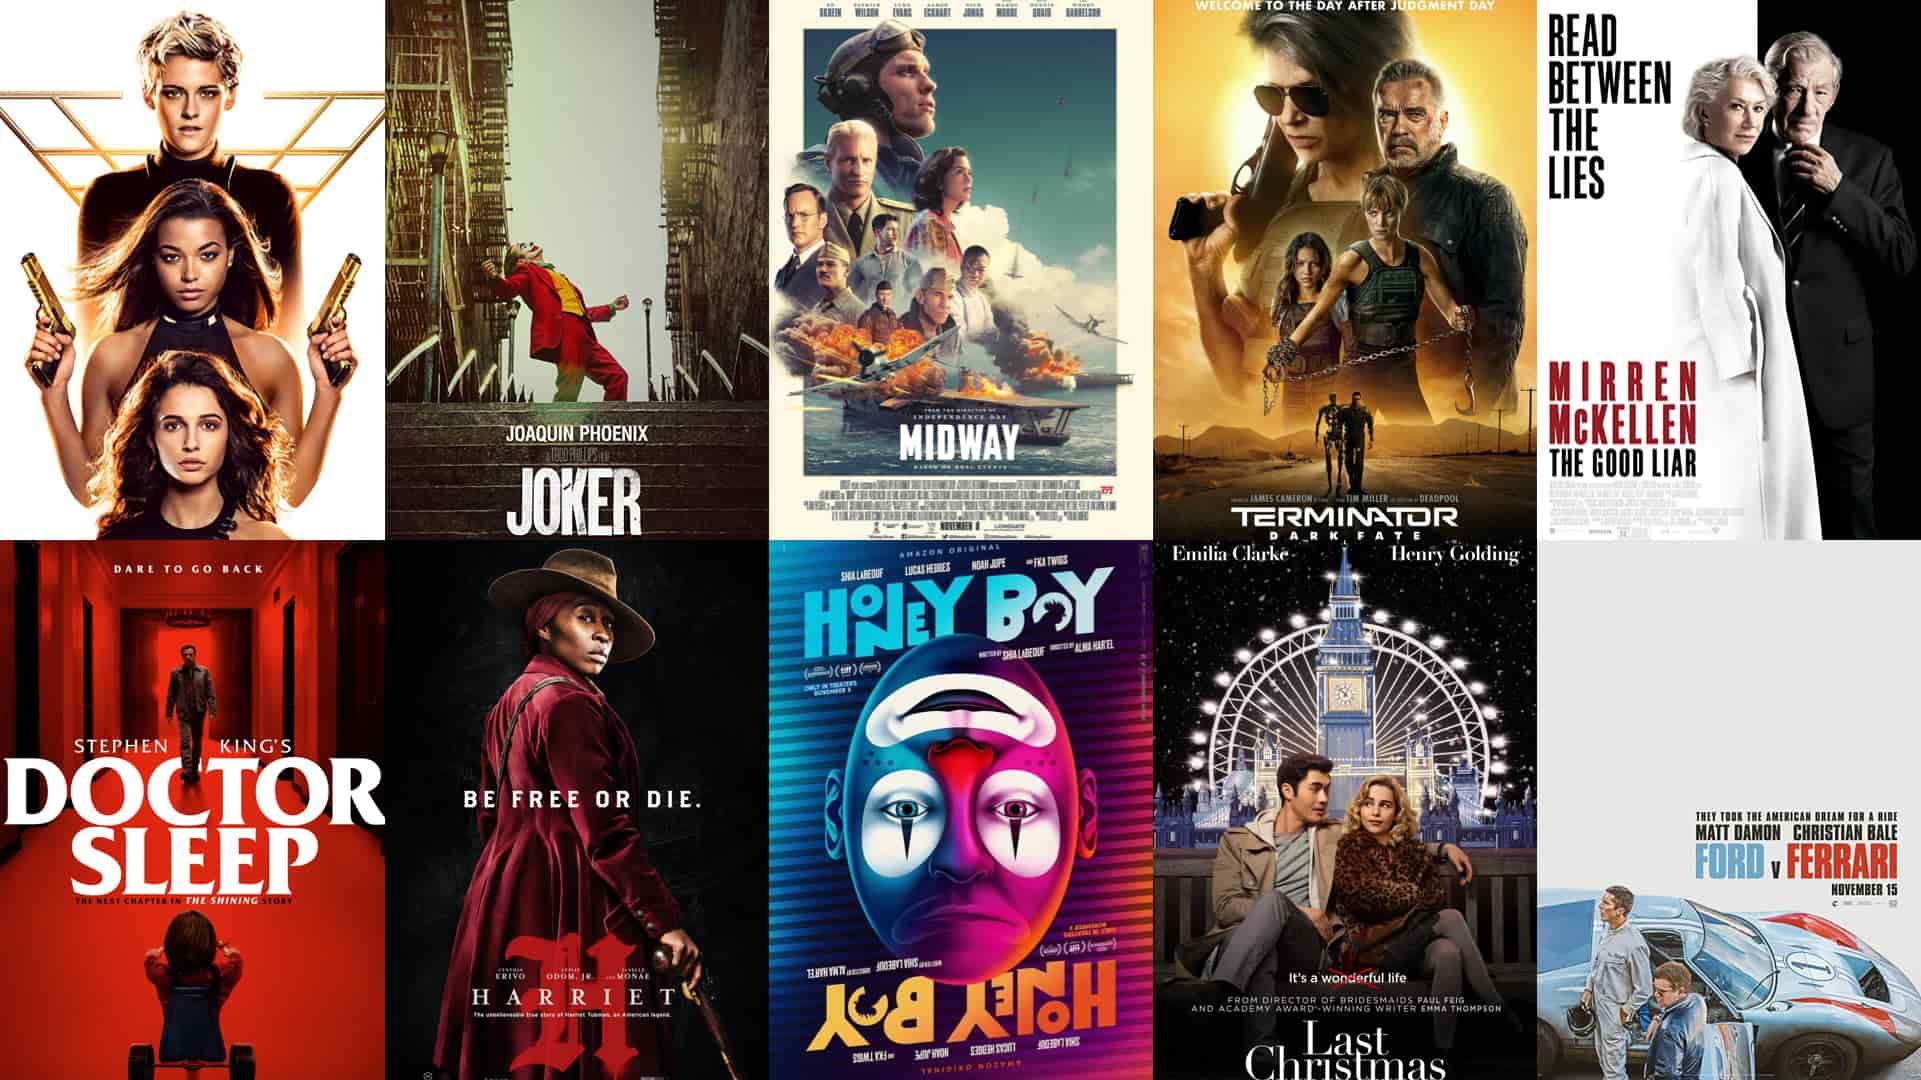 Box Office 11.18.19 - Feature - StudioBinder